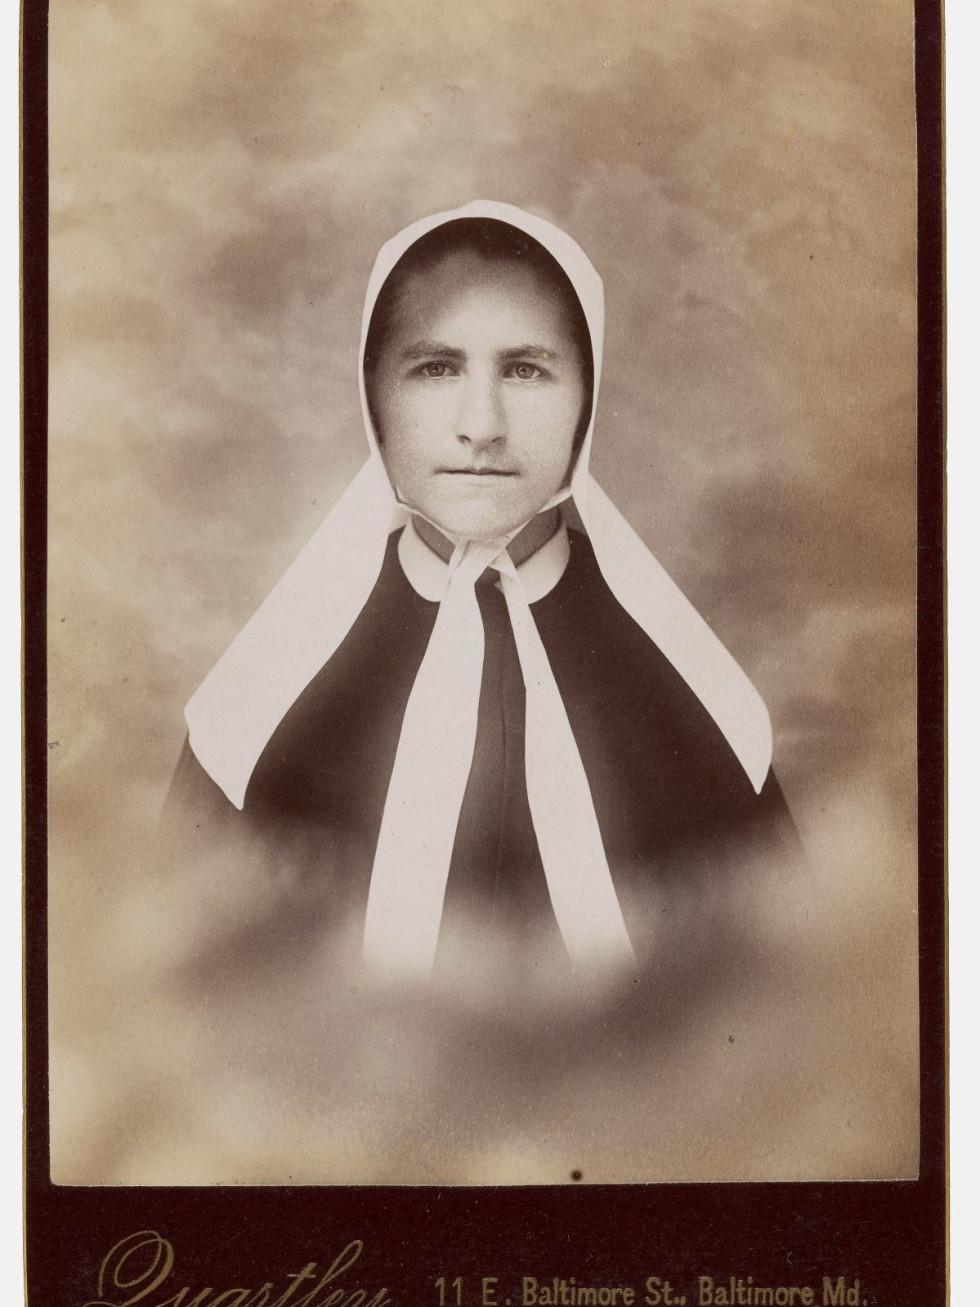 Charles Quartley, Baltimore, MD, [Church woman], 1880s